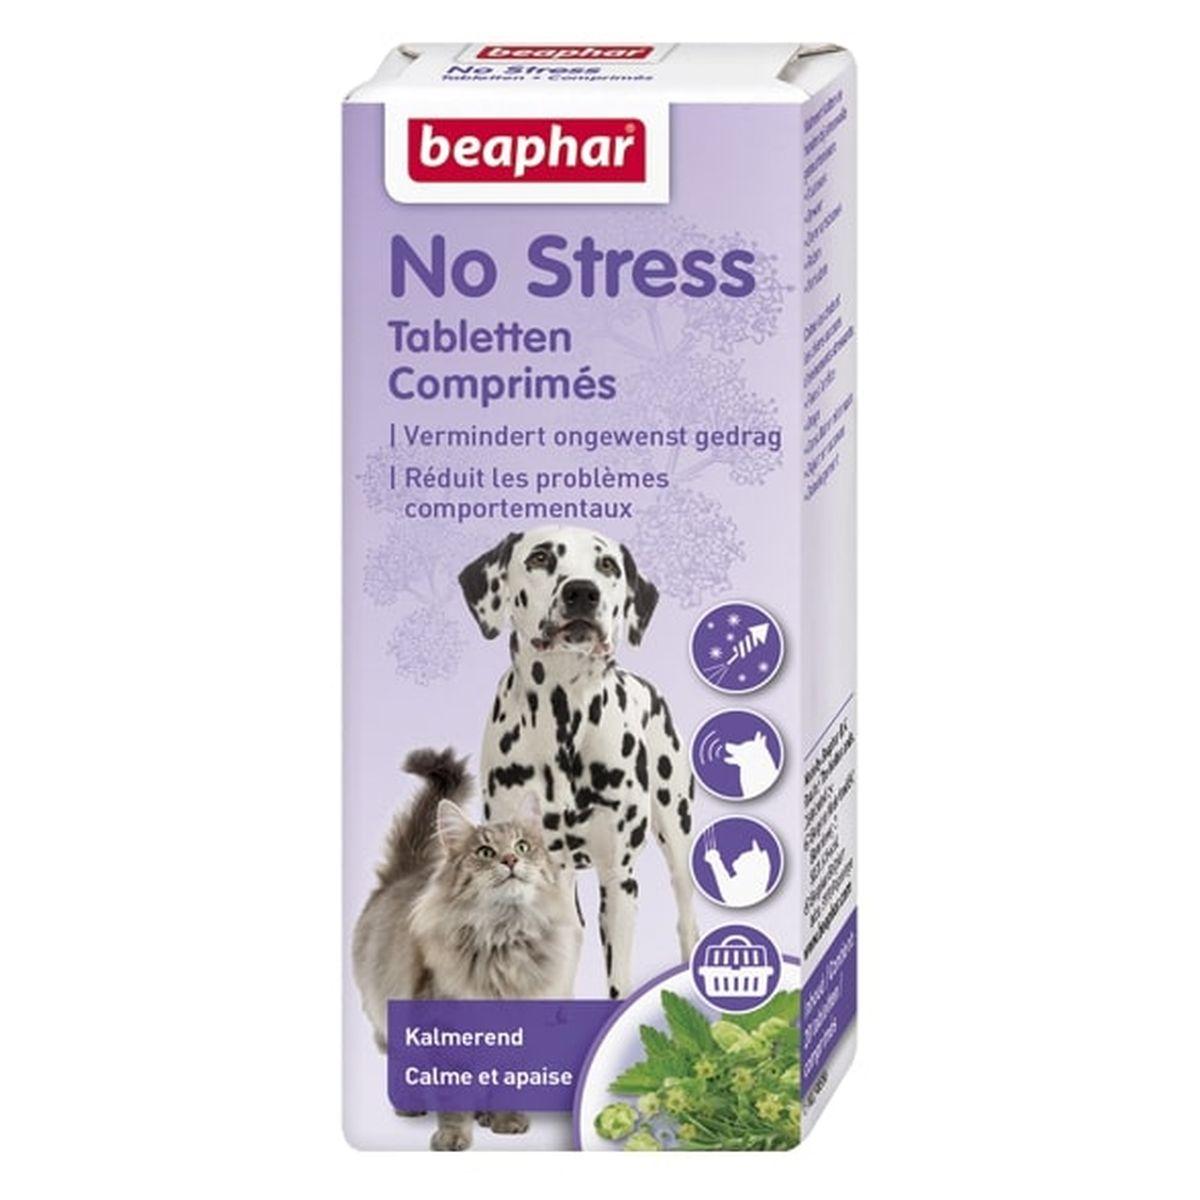 BEA NO STRESS ZENUWTABLET.20ST 00001